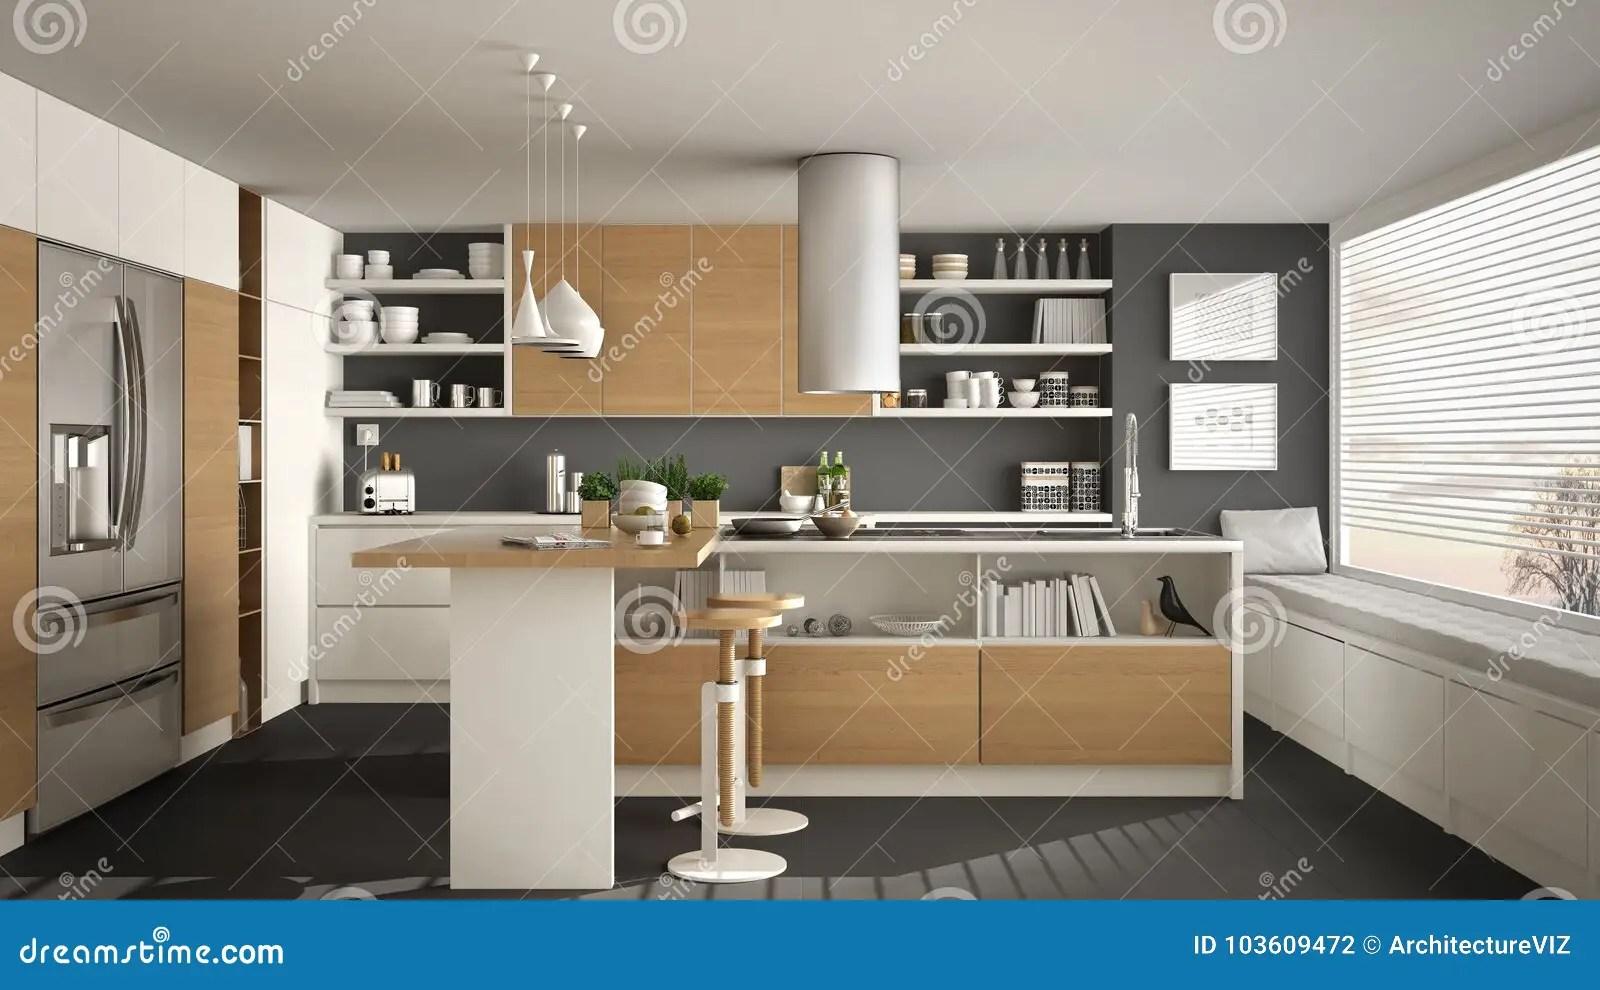 Cucina Moderna Grigia E Legno | Cucina Rovere Grigio E Bianco ...